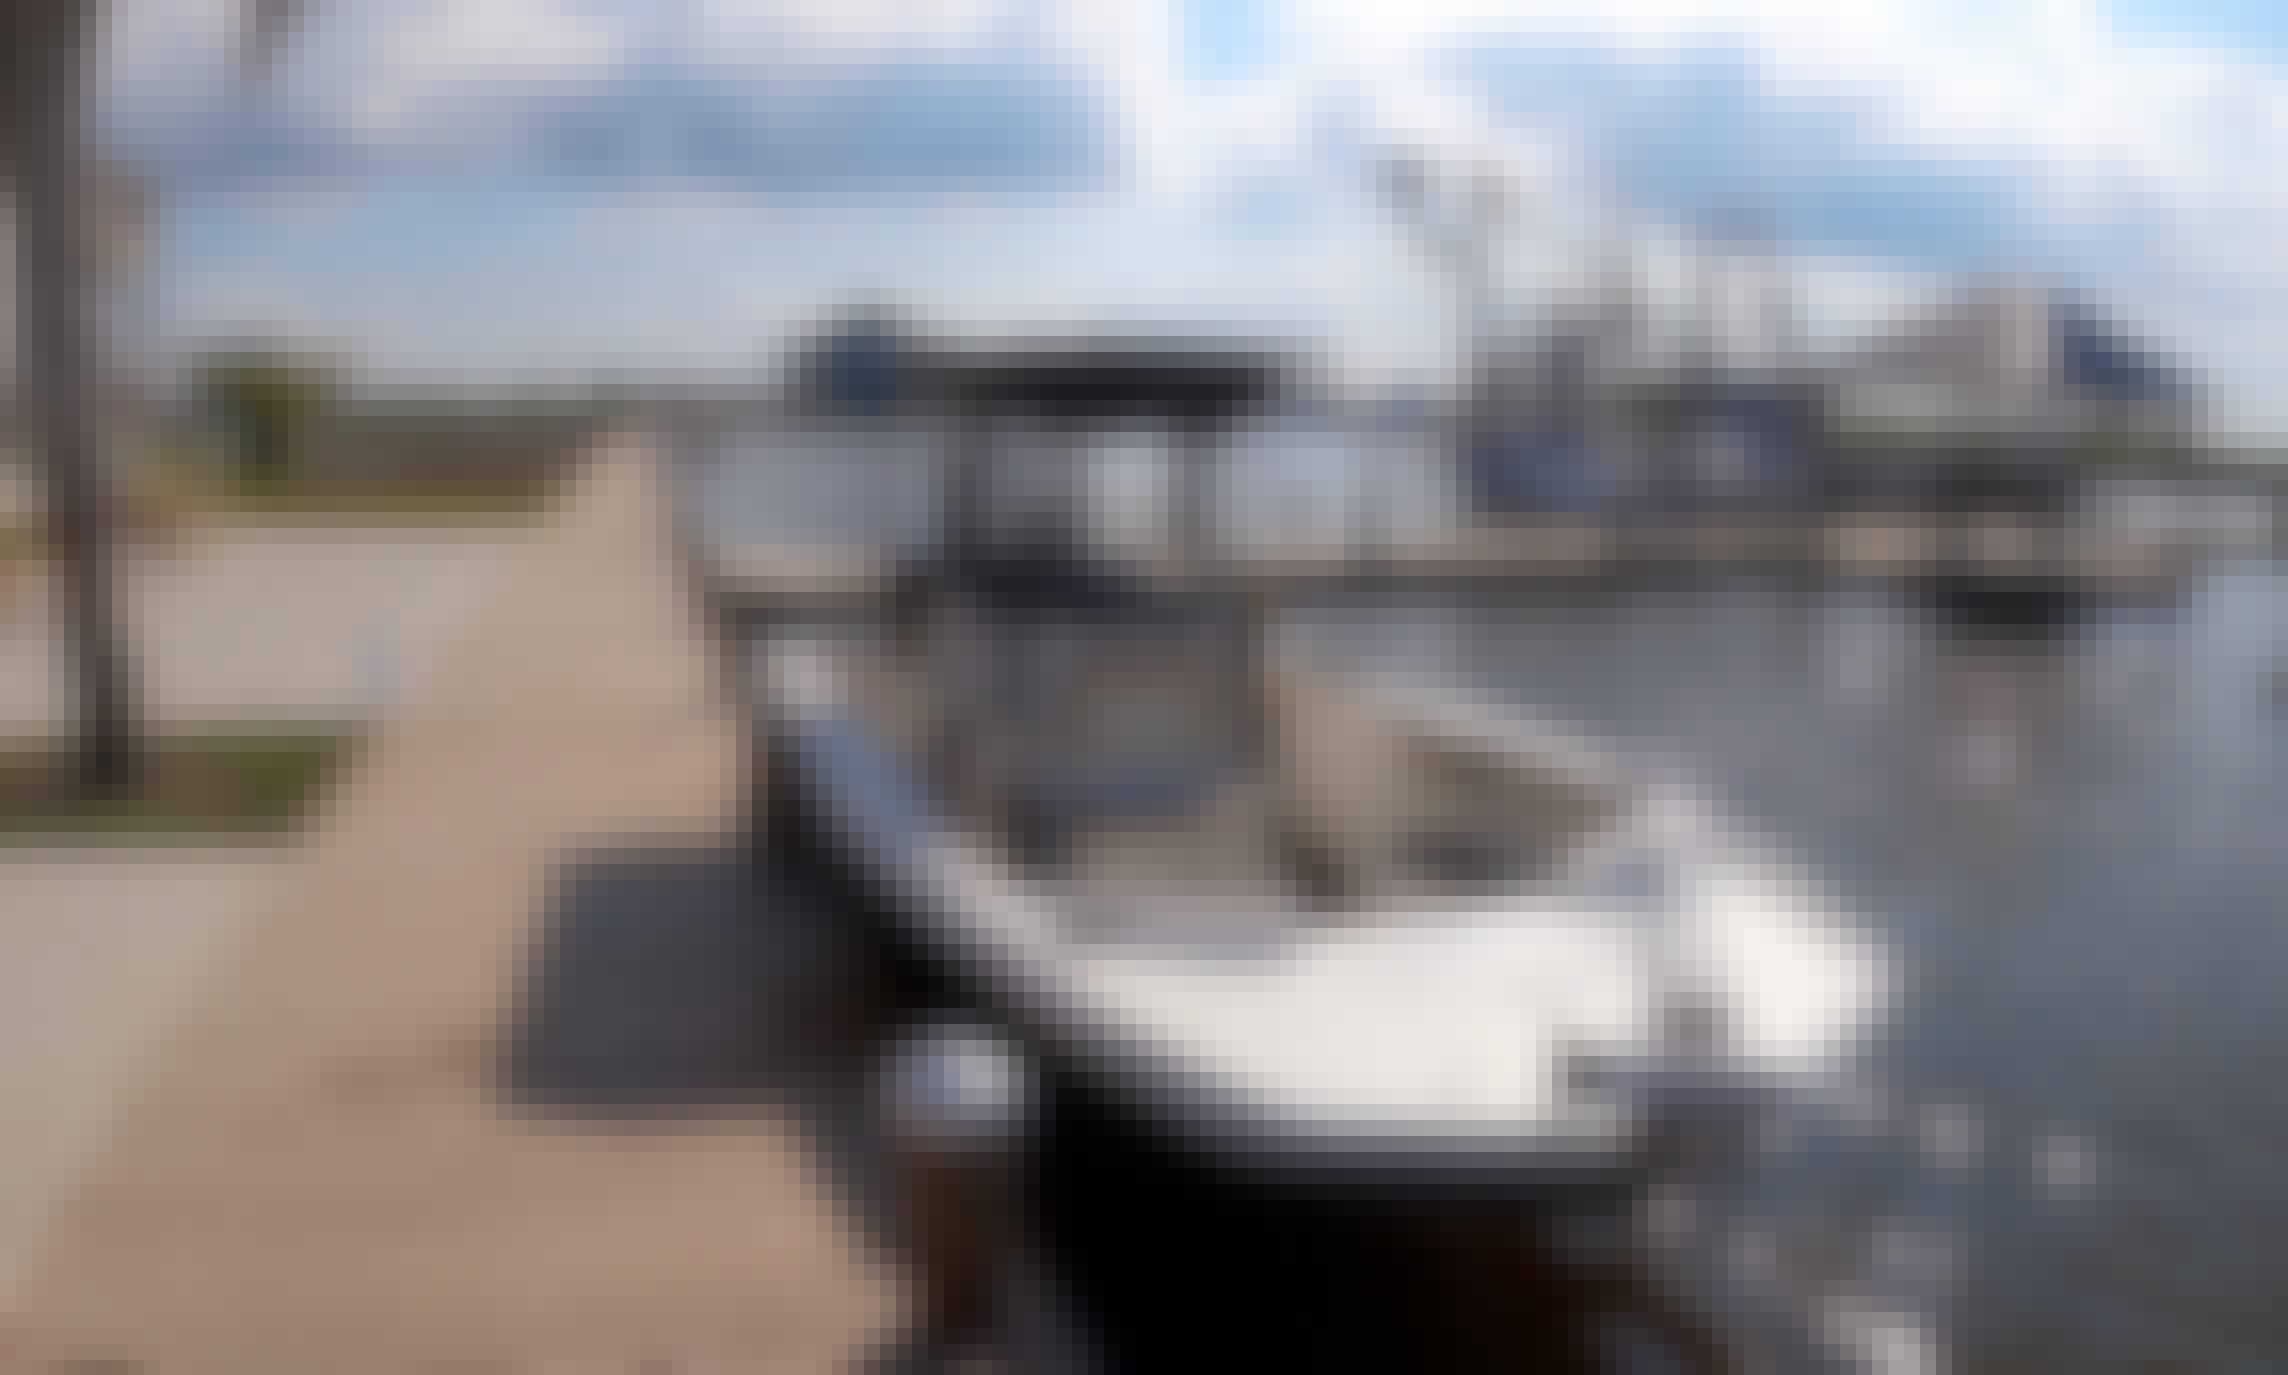 NauticStar Hybrid Inshore Water Sports in Myrtle Grove, Louisiana